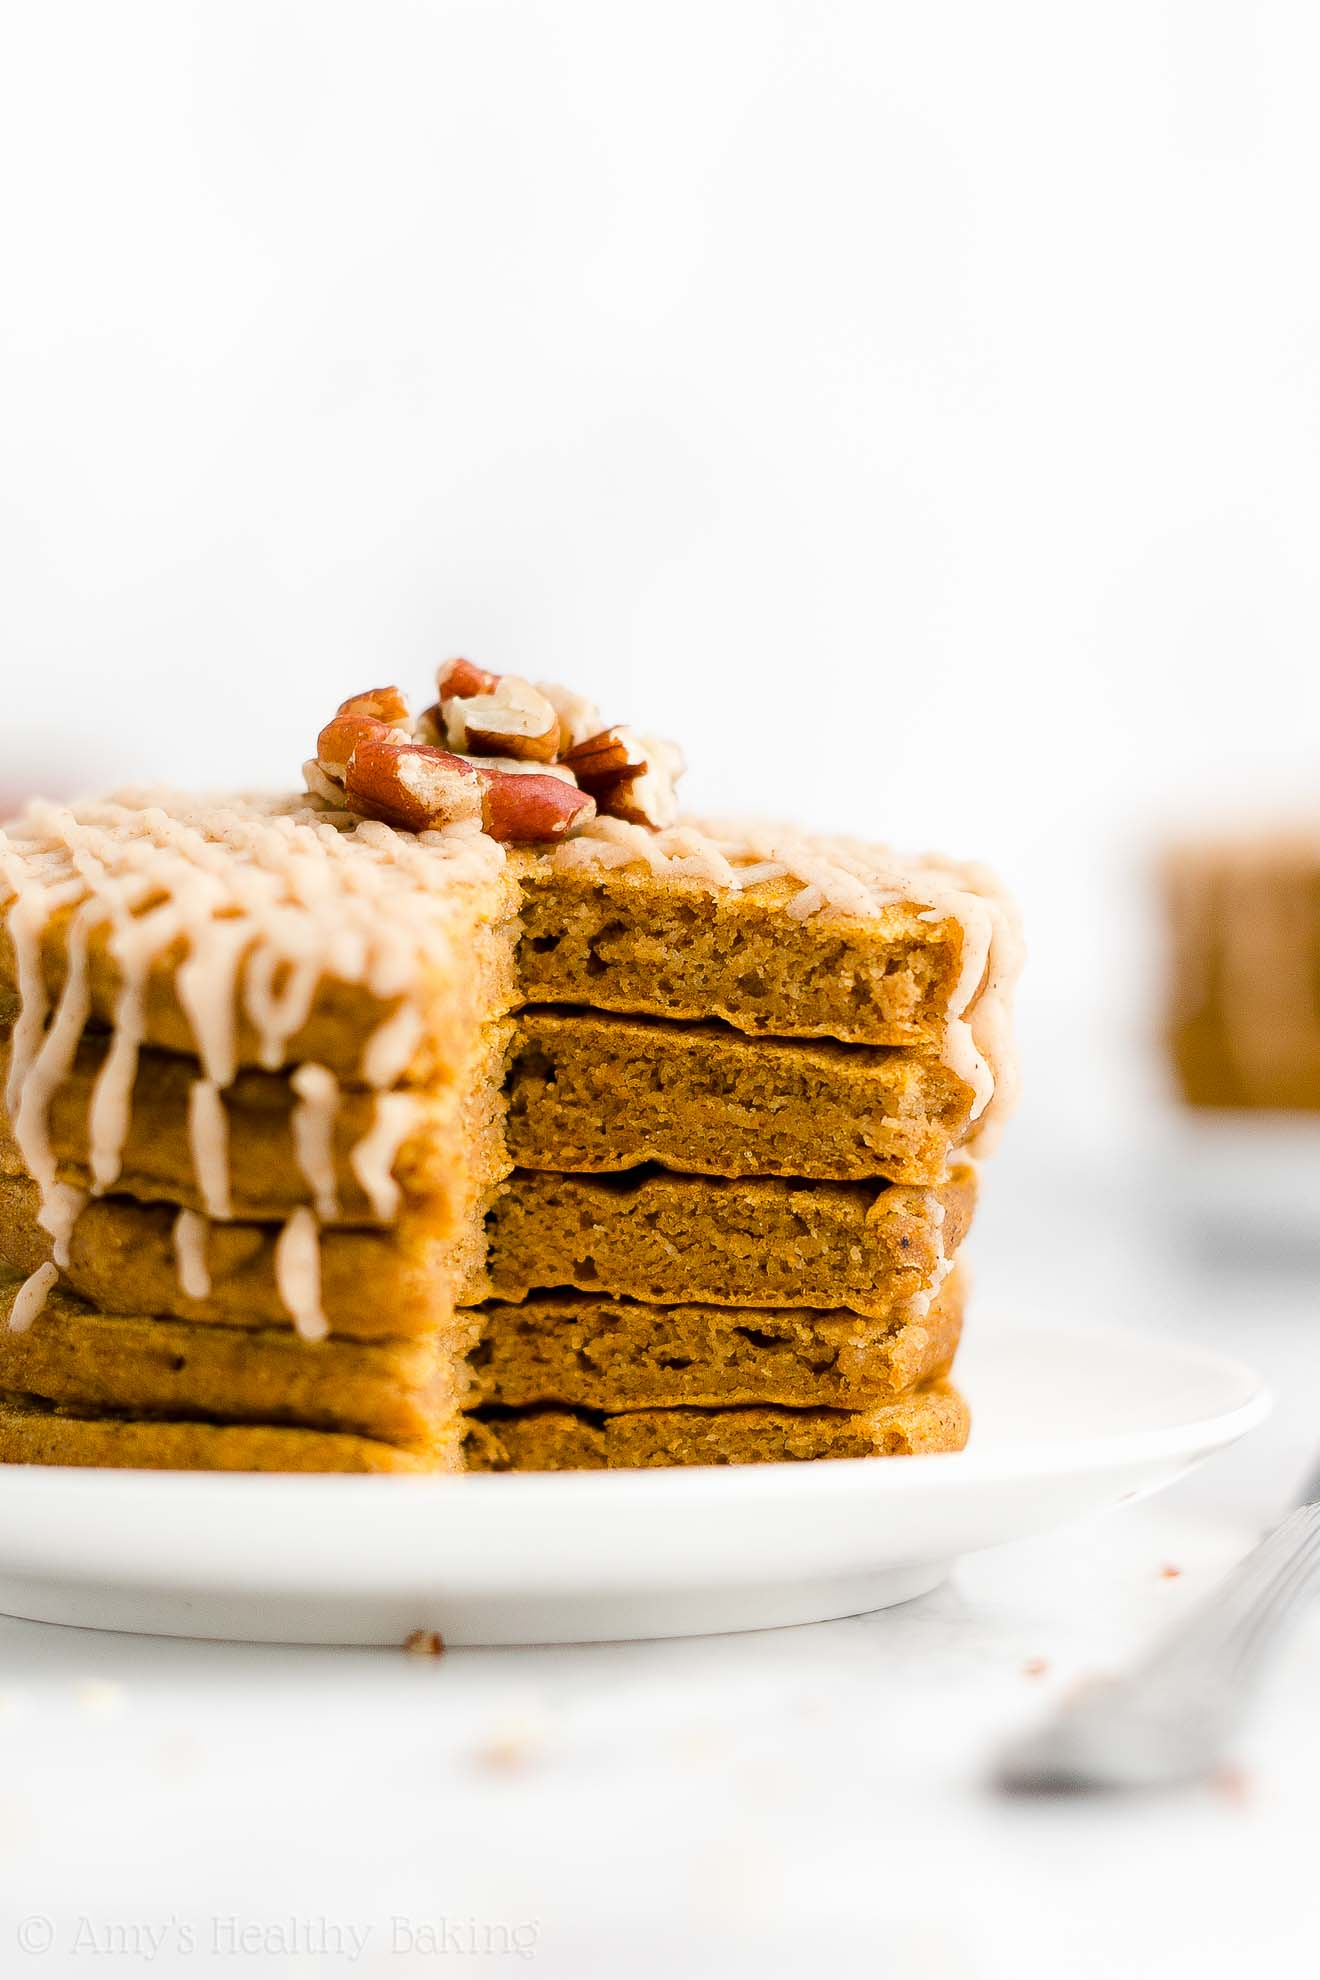 ULTIMATE Healthy Gluten Free Vegan Low Calorie Low Sugar Pumpkin Pancakes